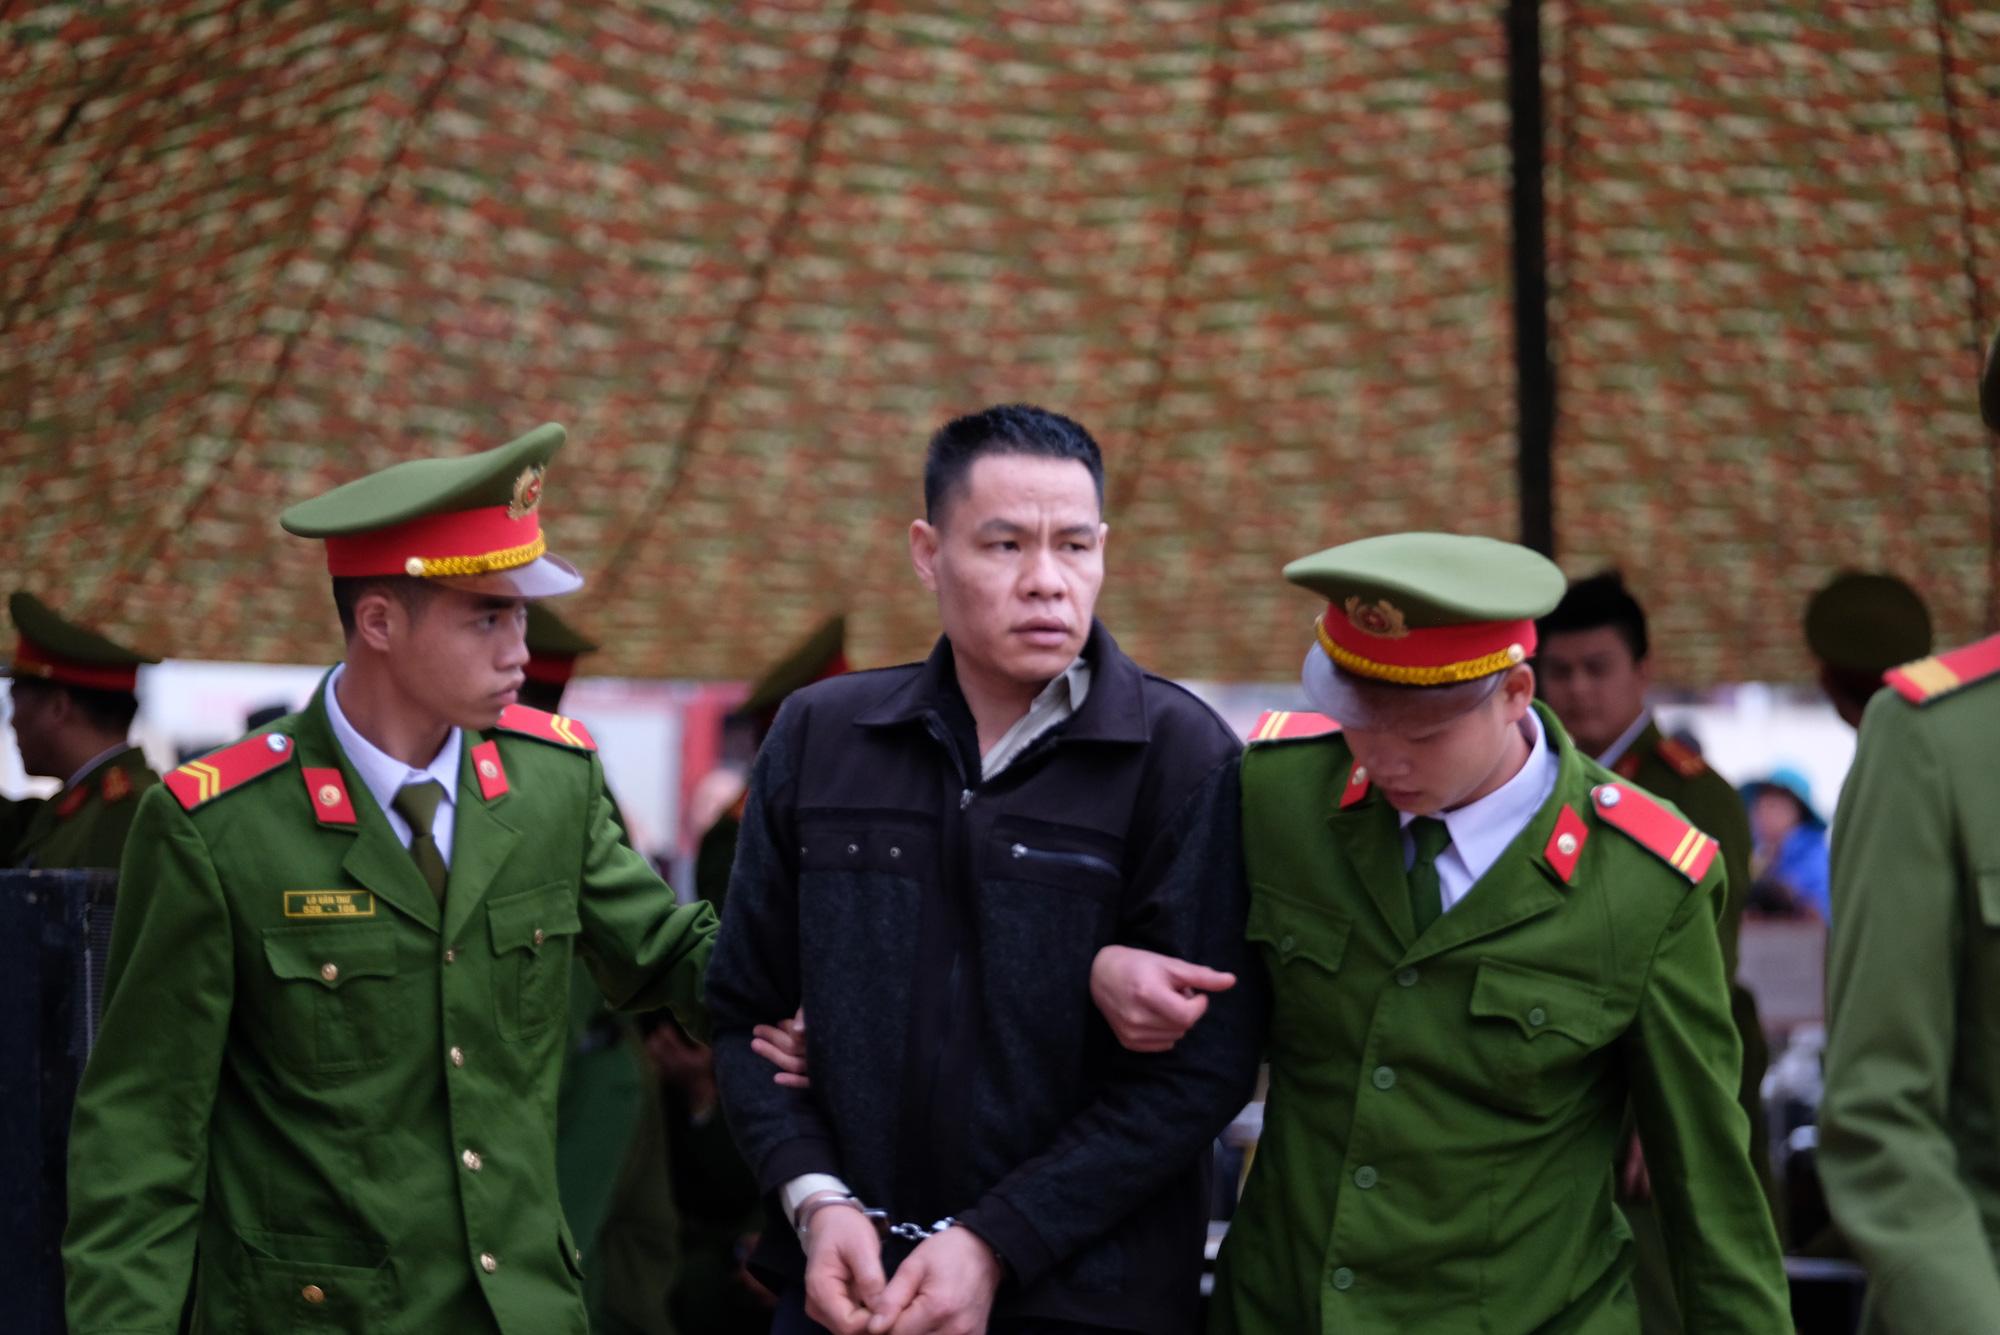 Vi Van Toan at the trial in Dien Bien Province on December 29, 2019. Photo: Nam Tran / Tuoi Tre